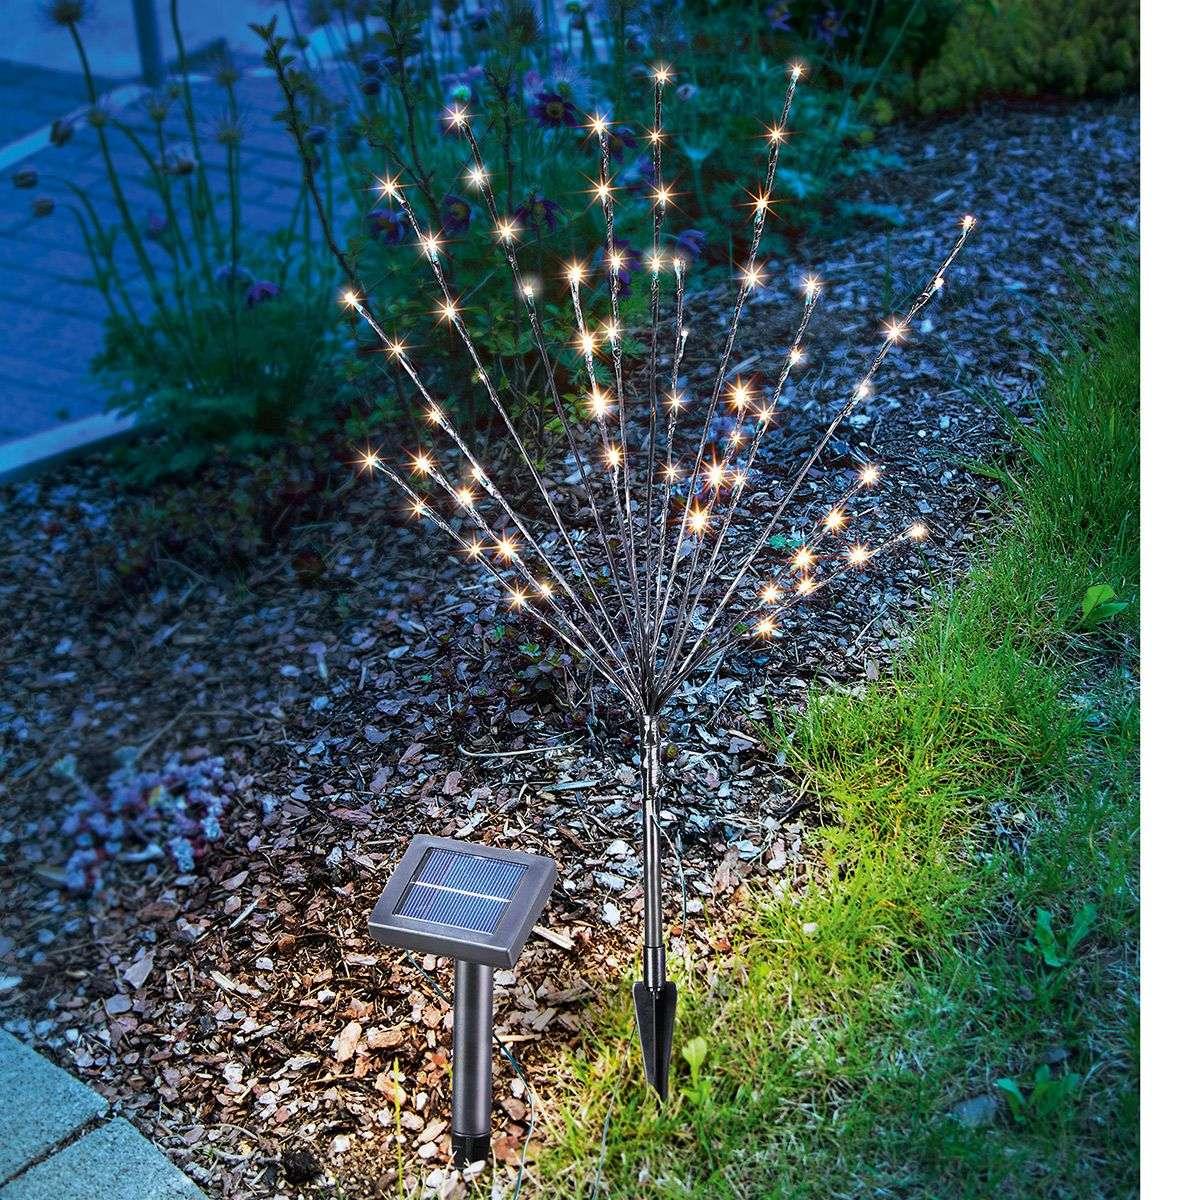 Led solar outdoor decorative light light bush lights led solar outdoor decorative light light bush 3012510 31 aloadofball Gallery